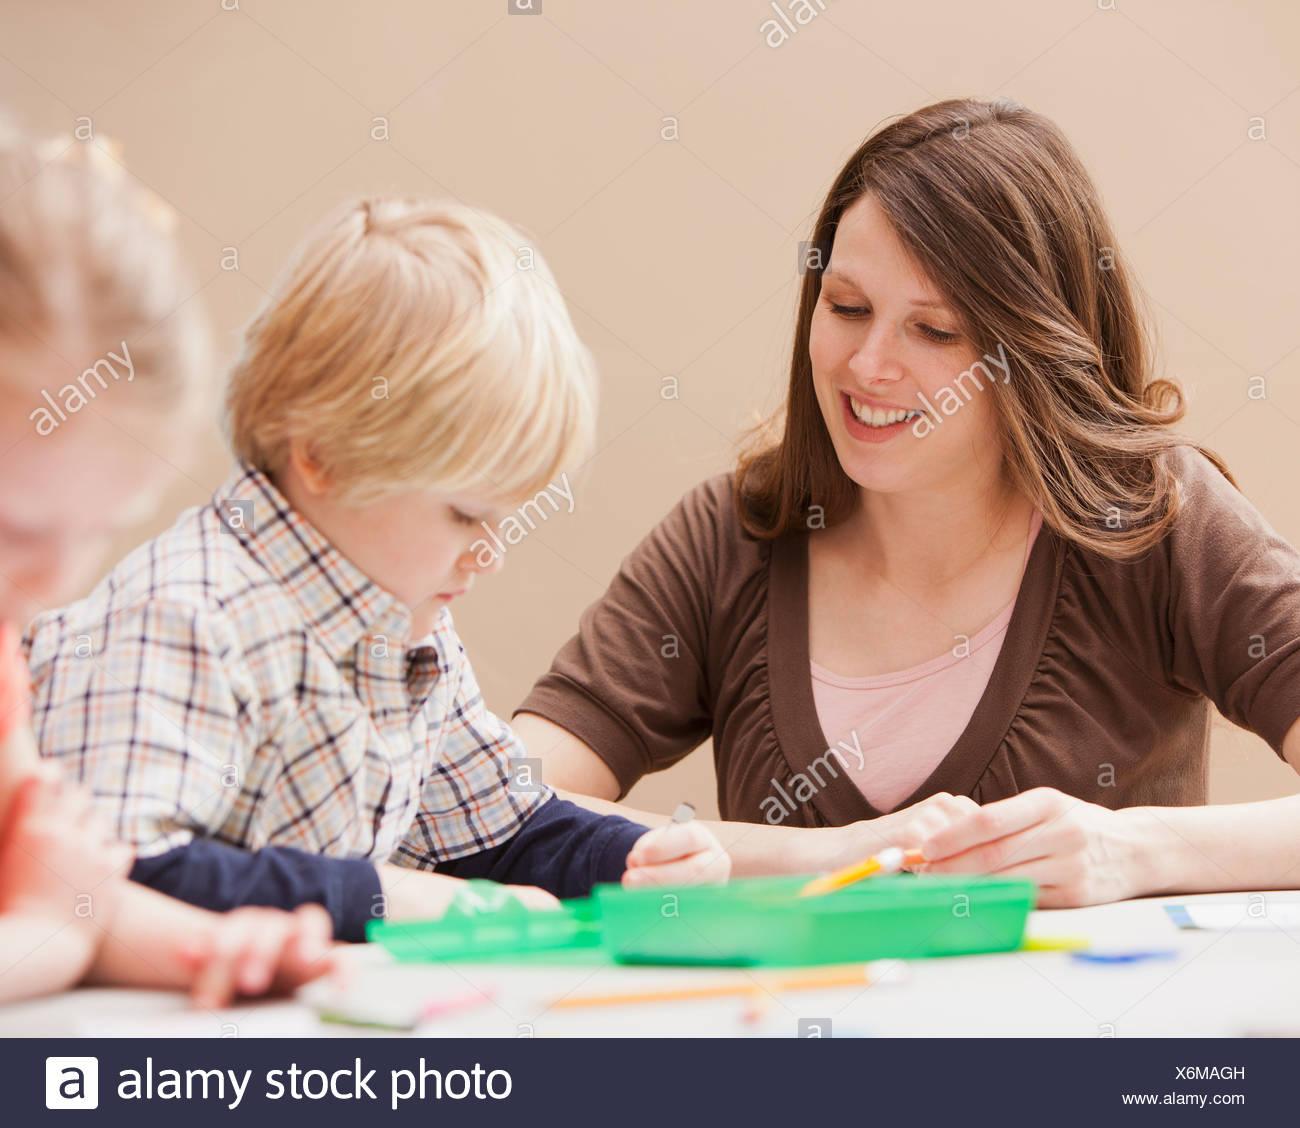 Mid adult woman teaching boy (4-5) drawing in kindergarten - Stock Image